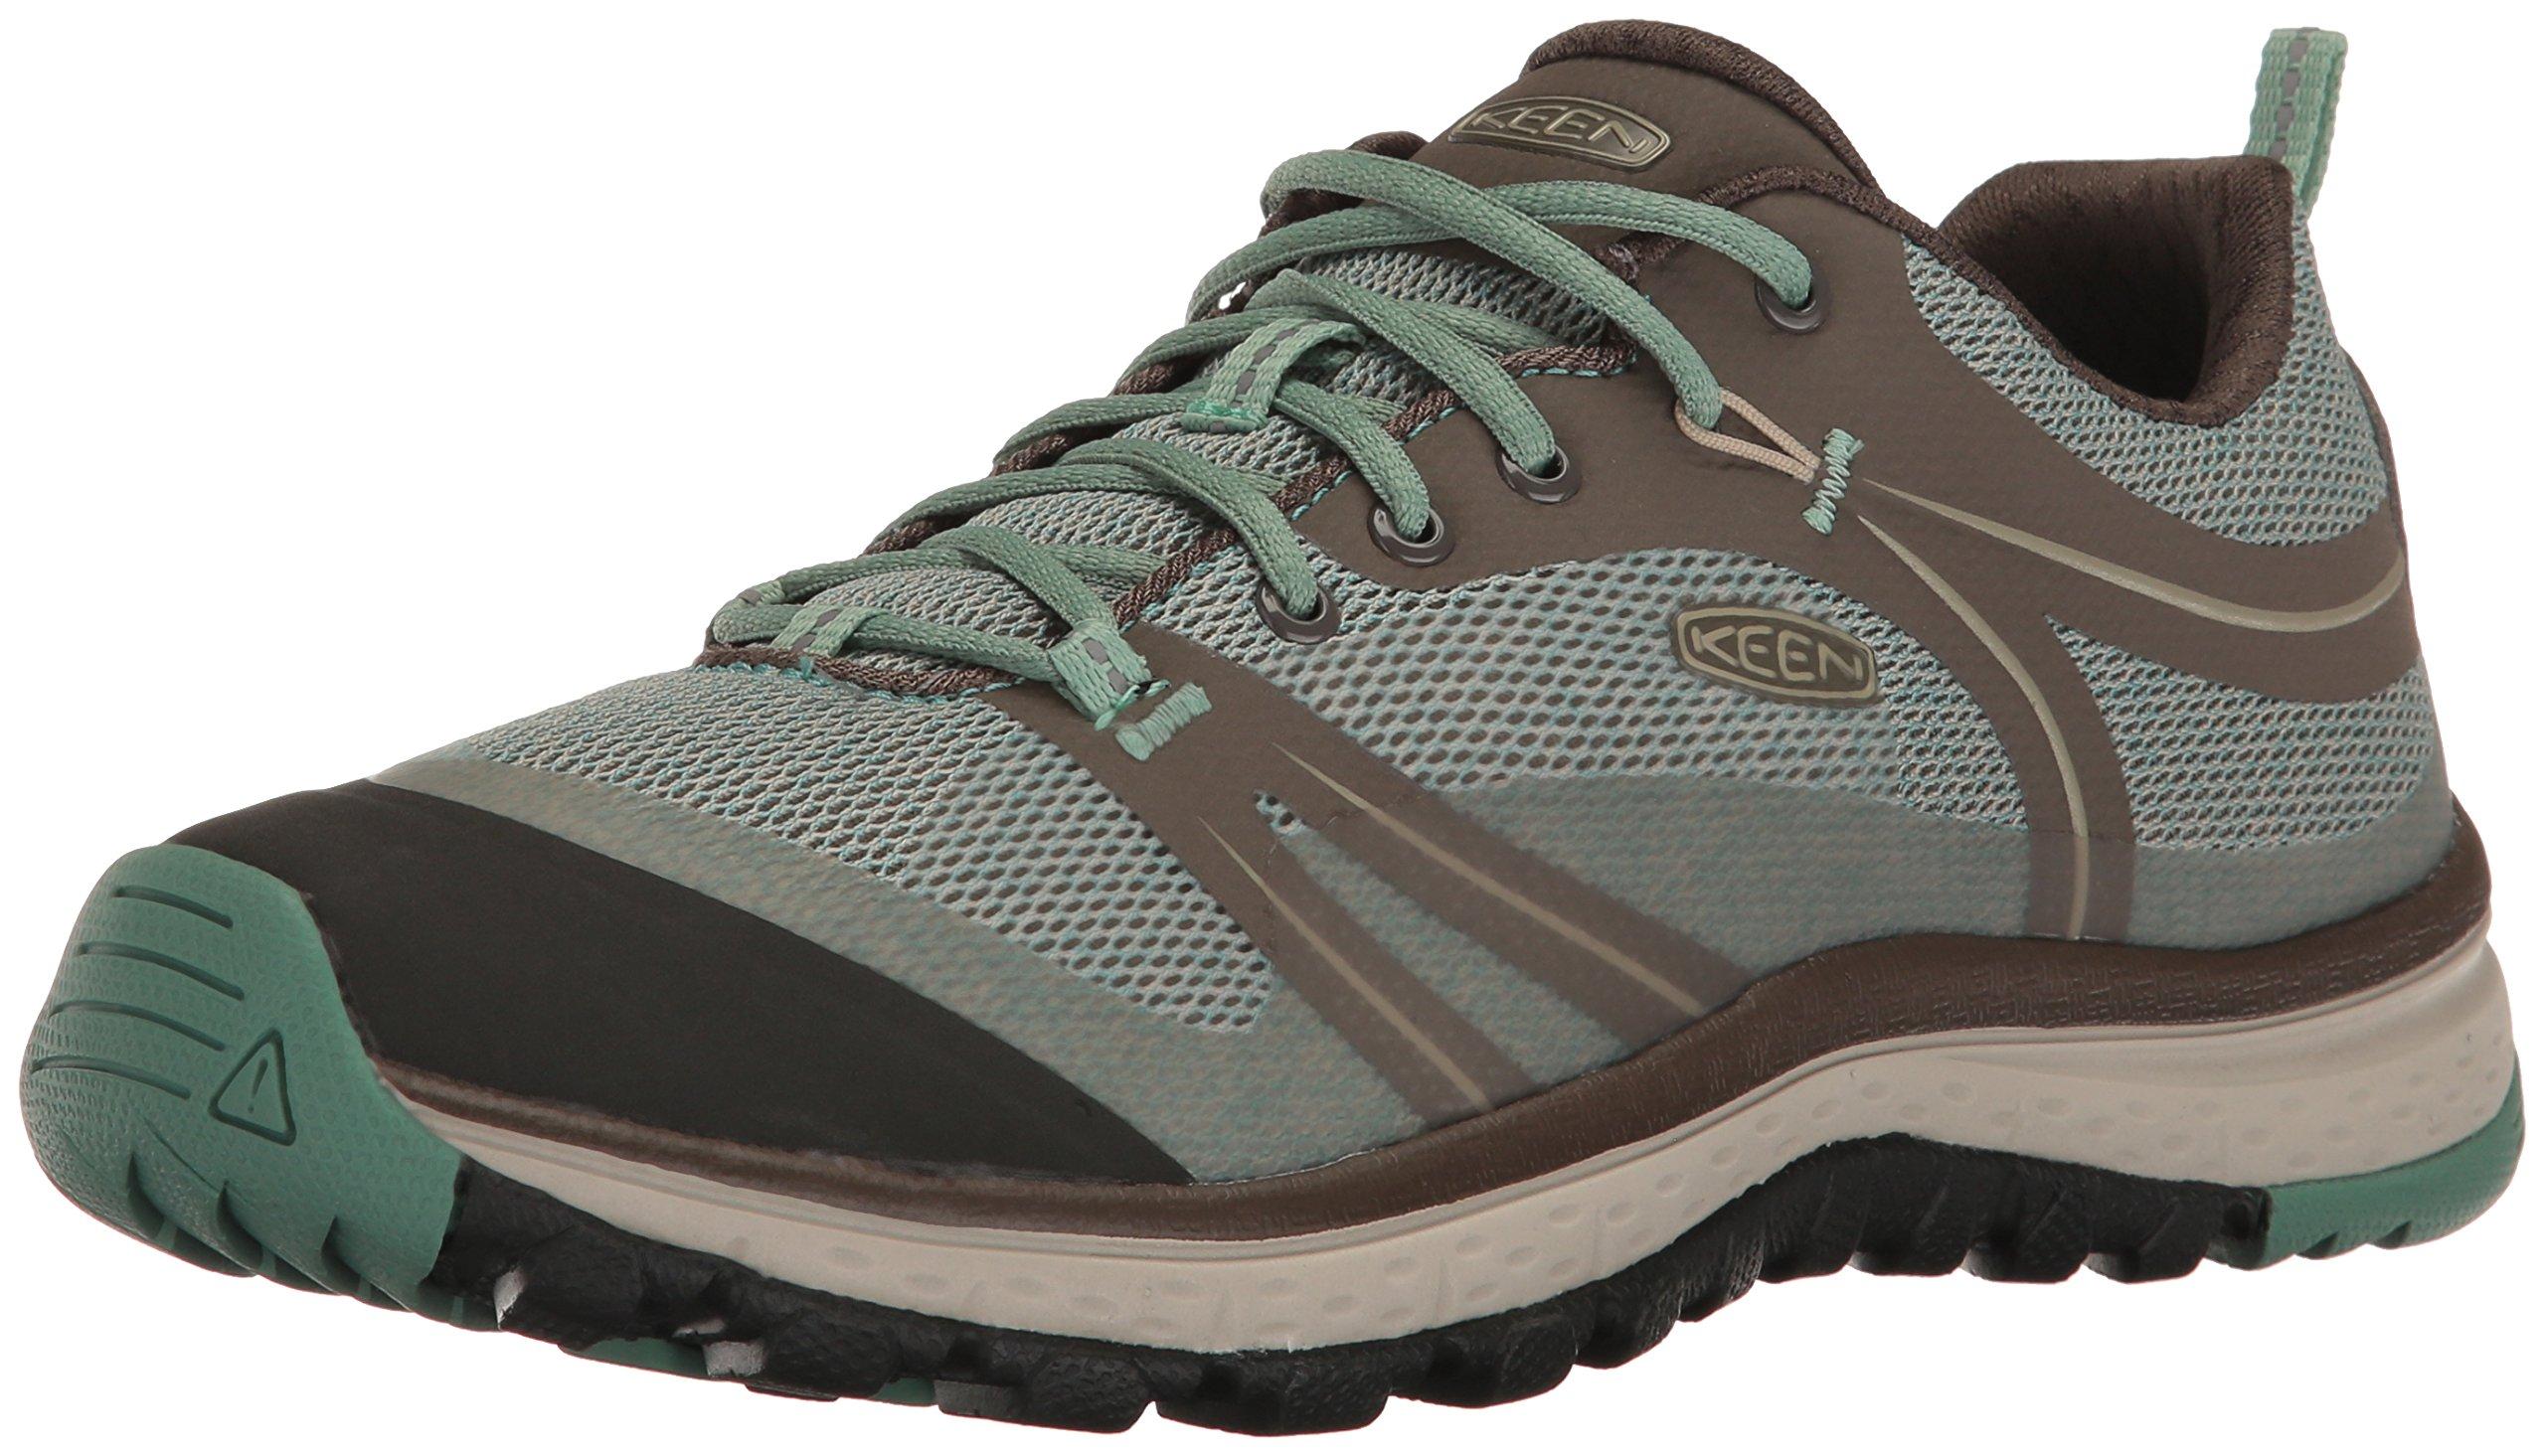 KEEN Women's Terradora Hiking Shoe, Radiance/Goat, 10 M US